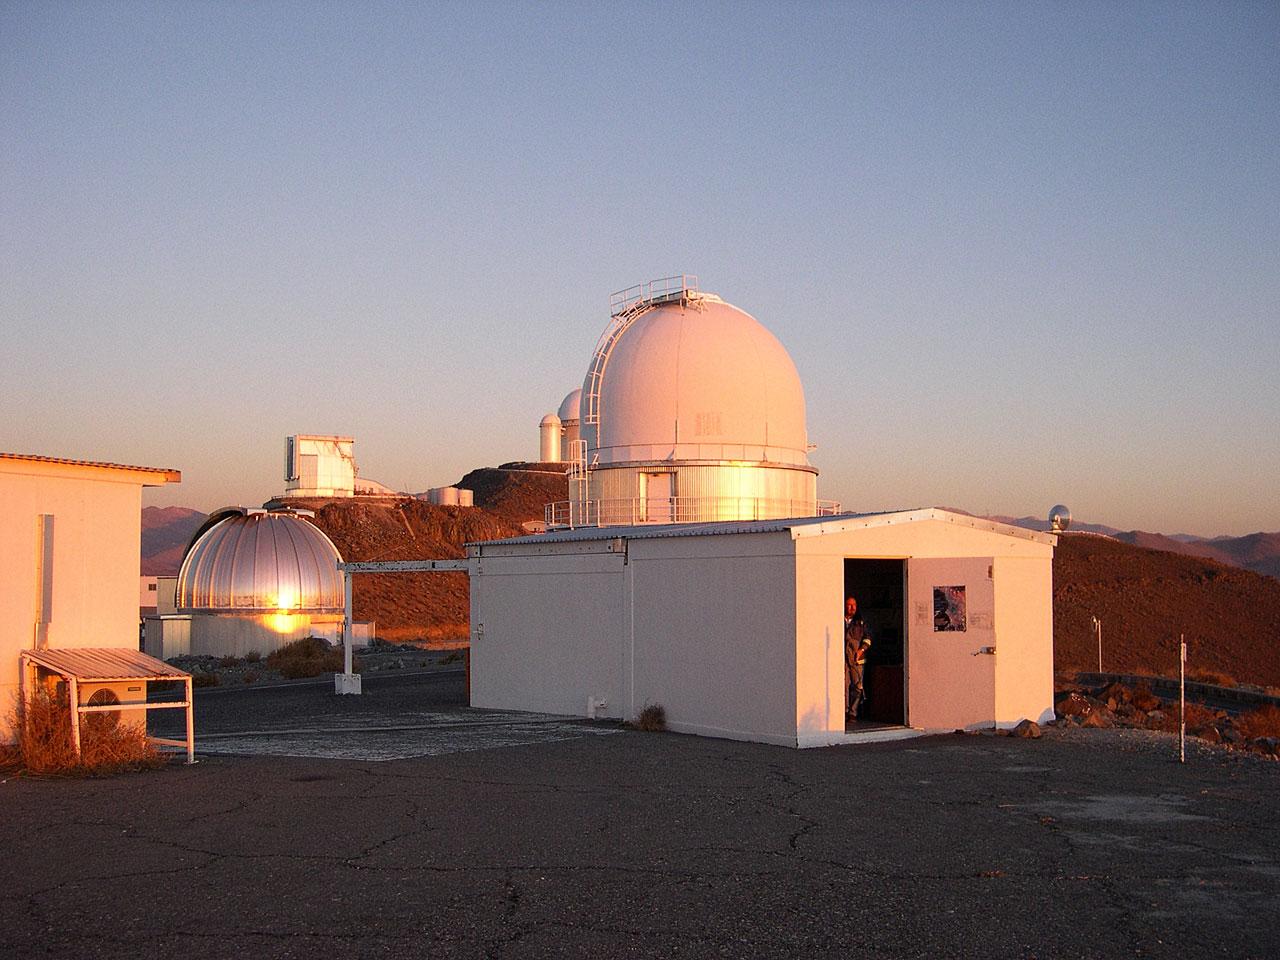 Marseille 0.36-metre Telescope